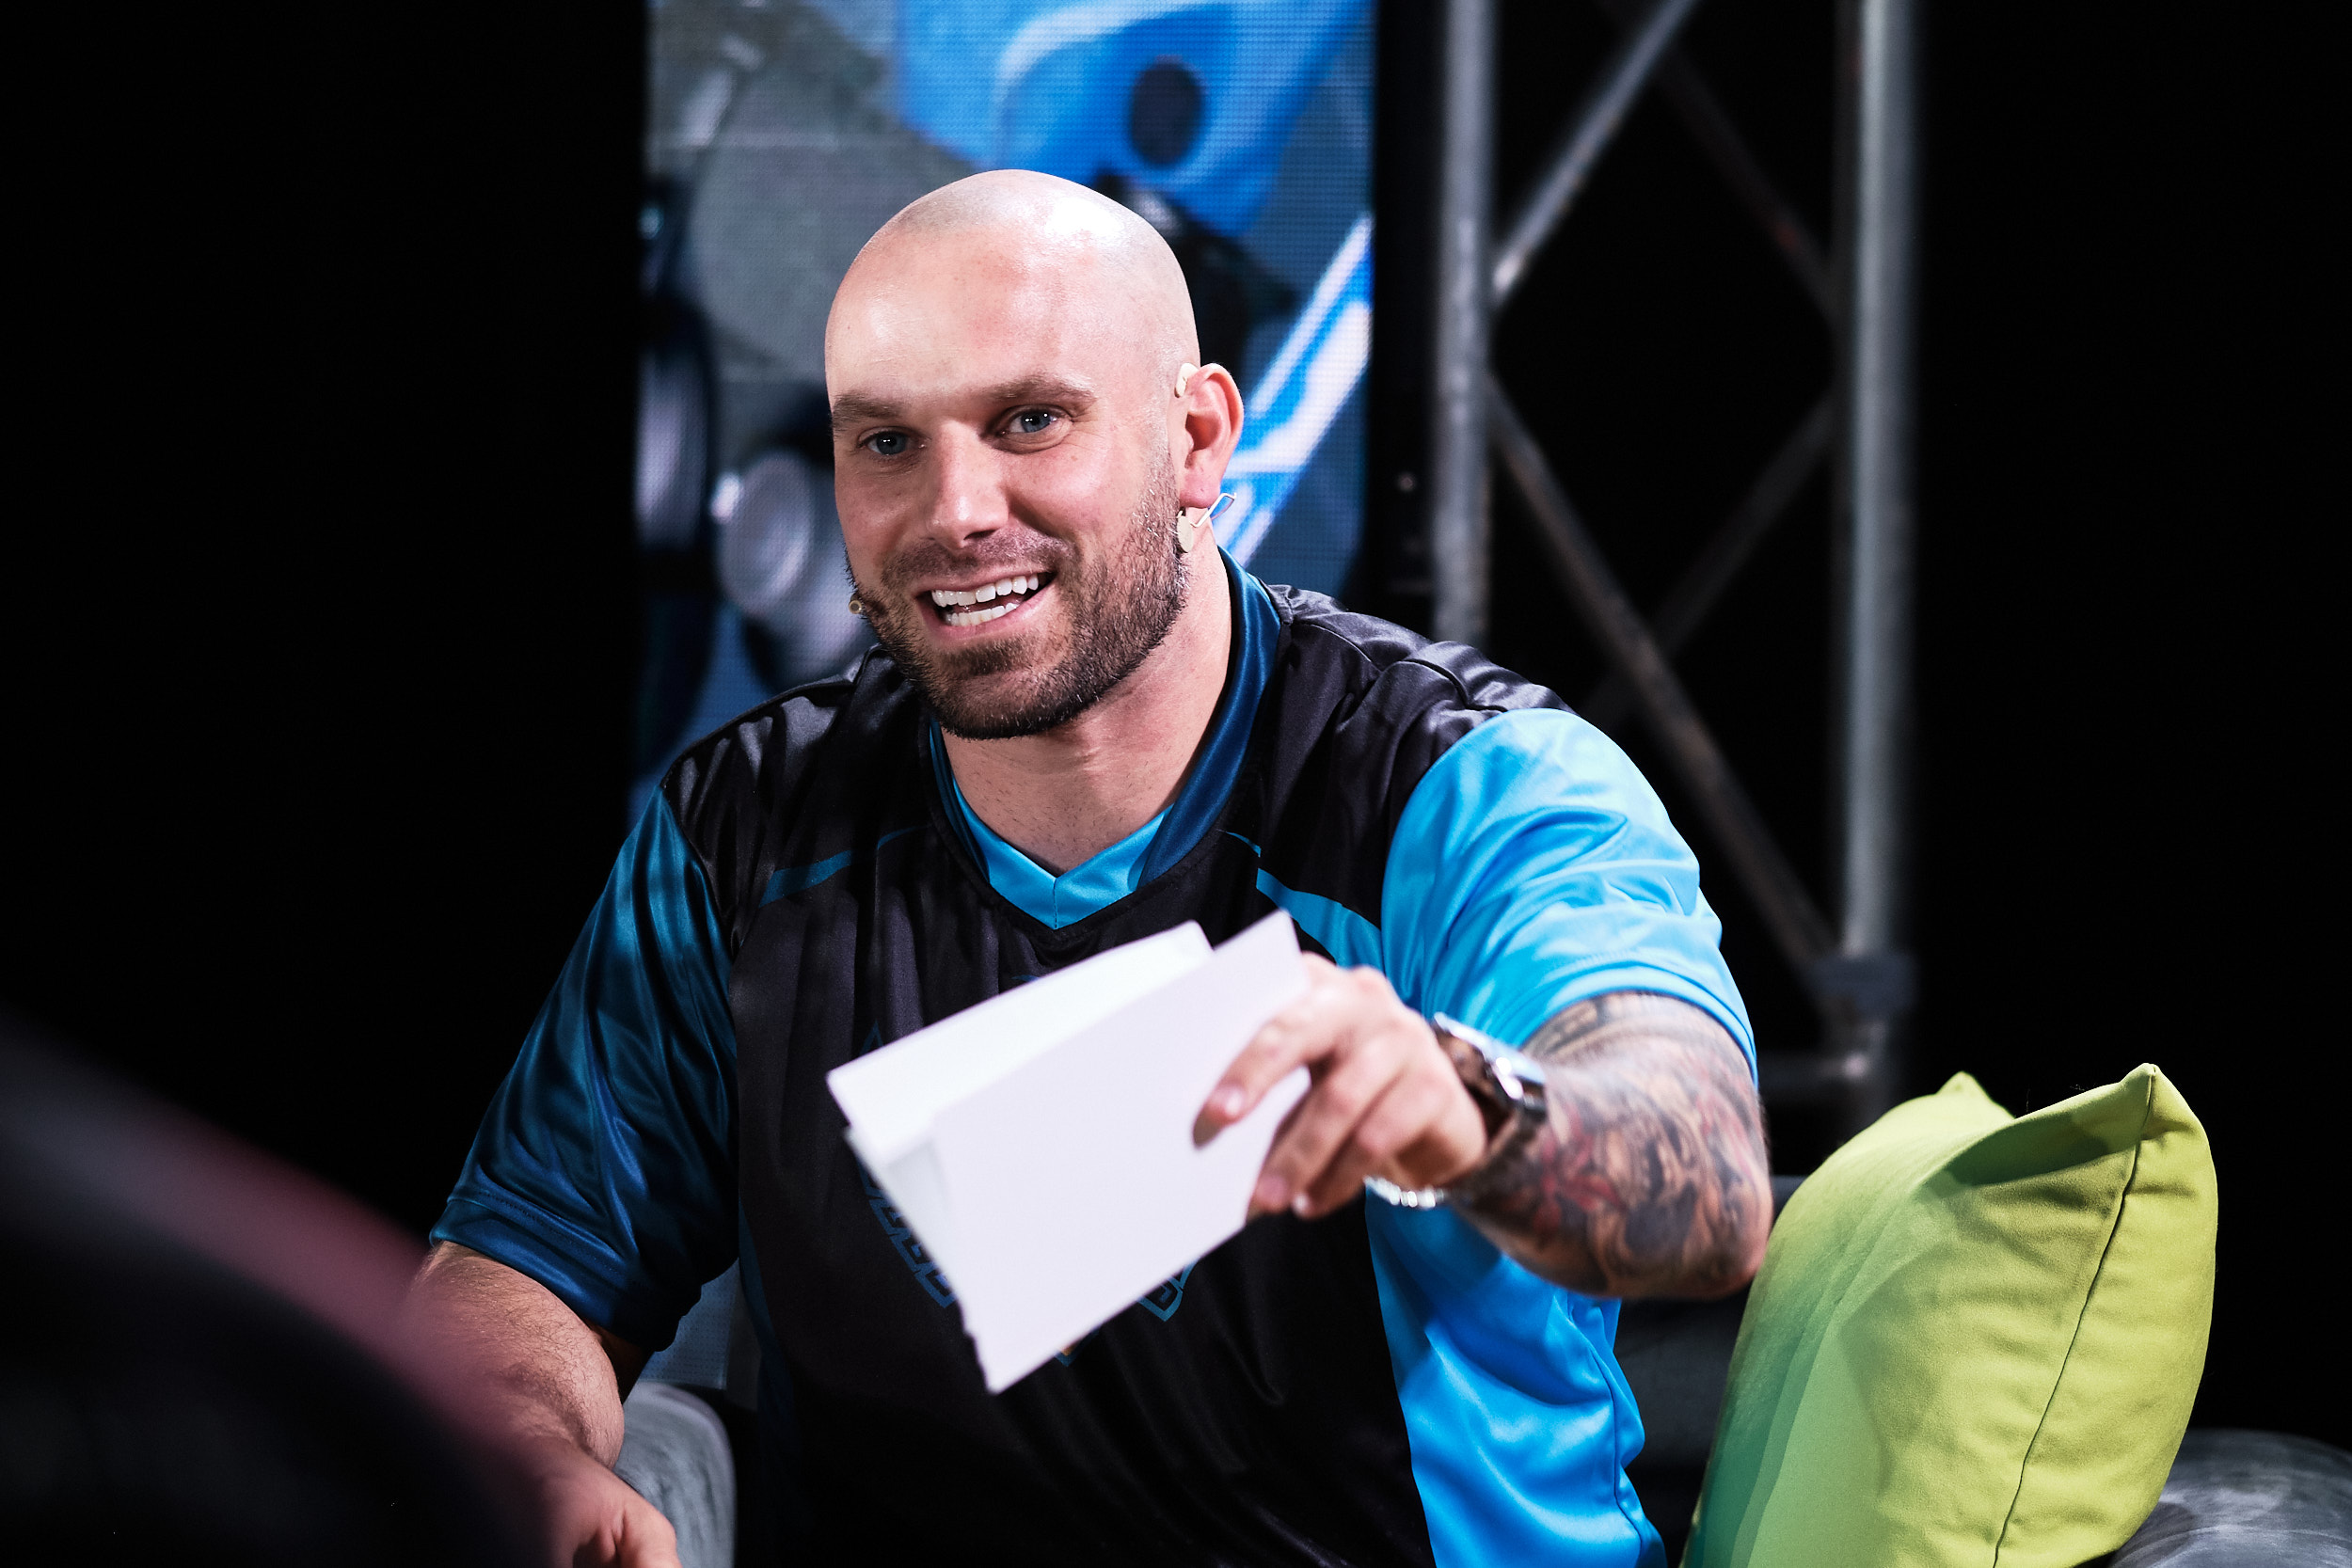 ÉtienneBoulay